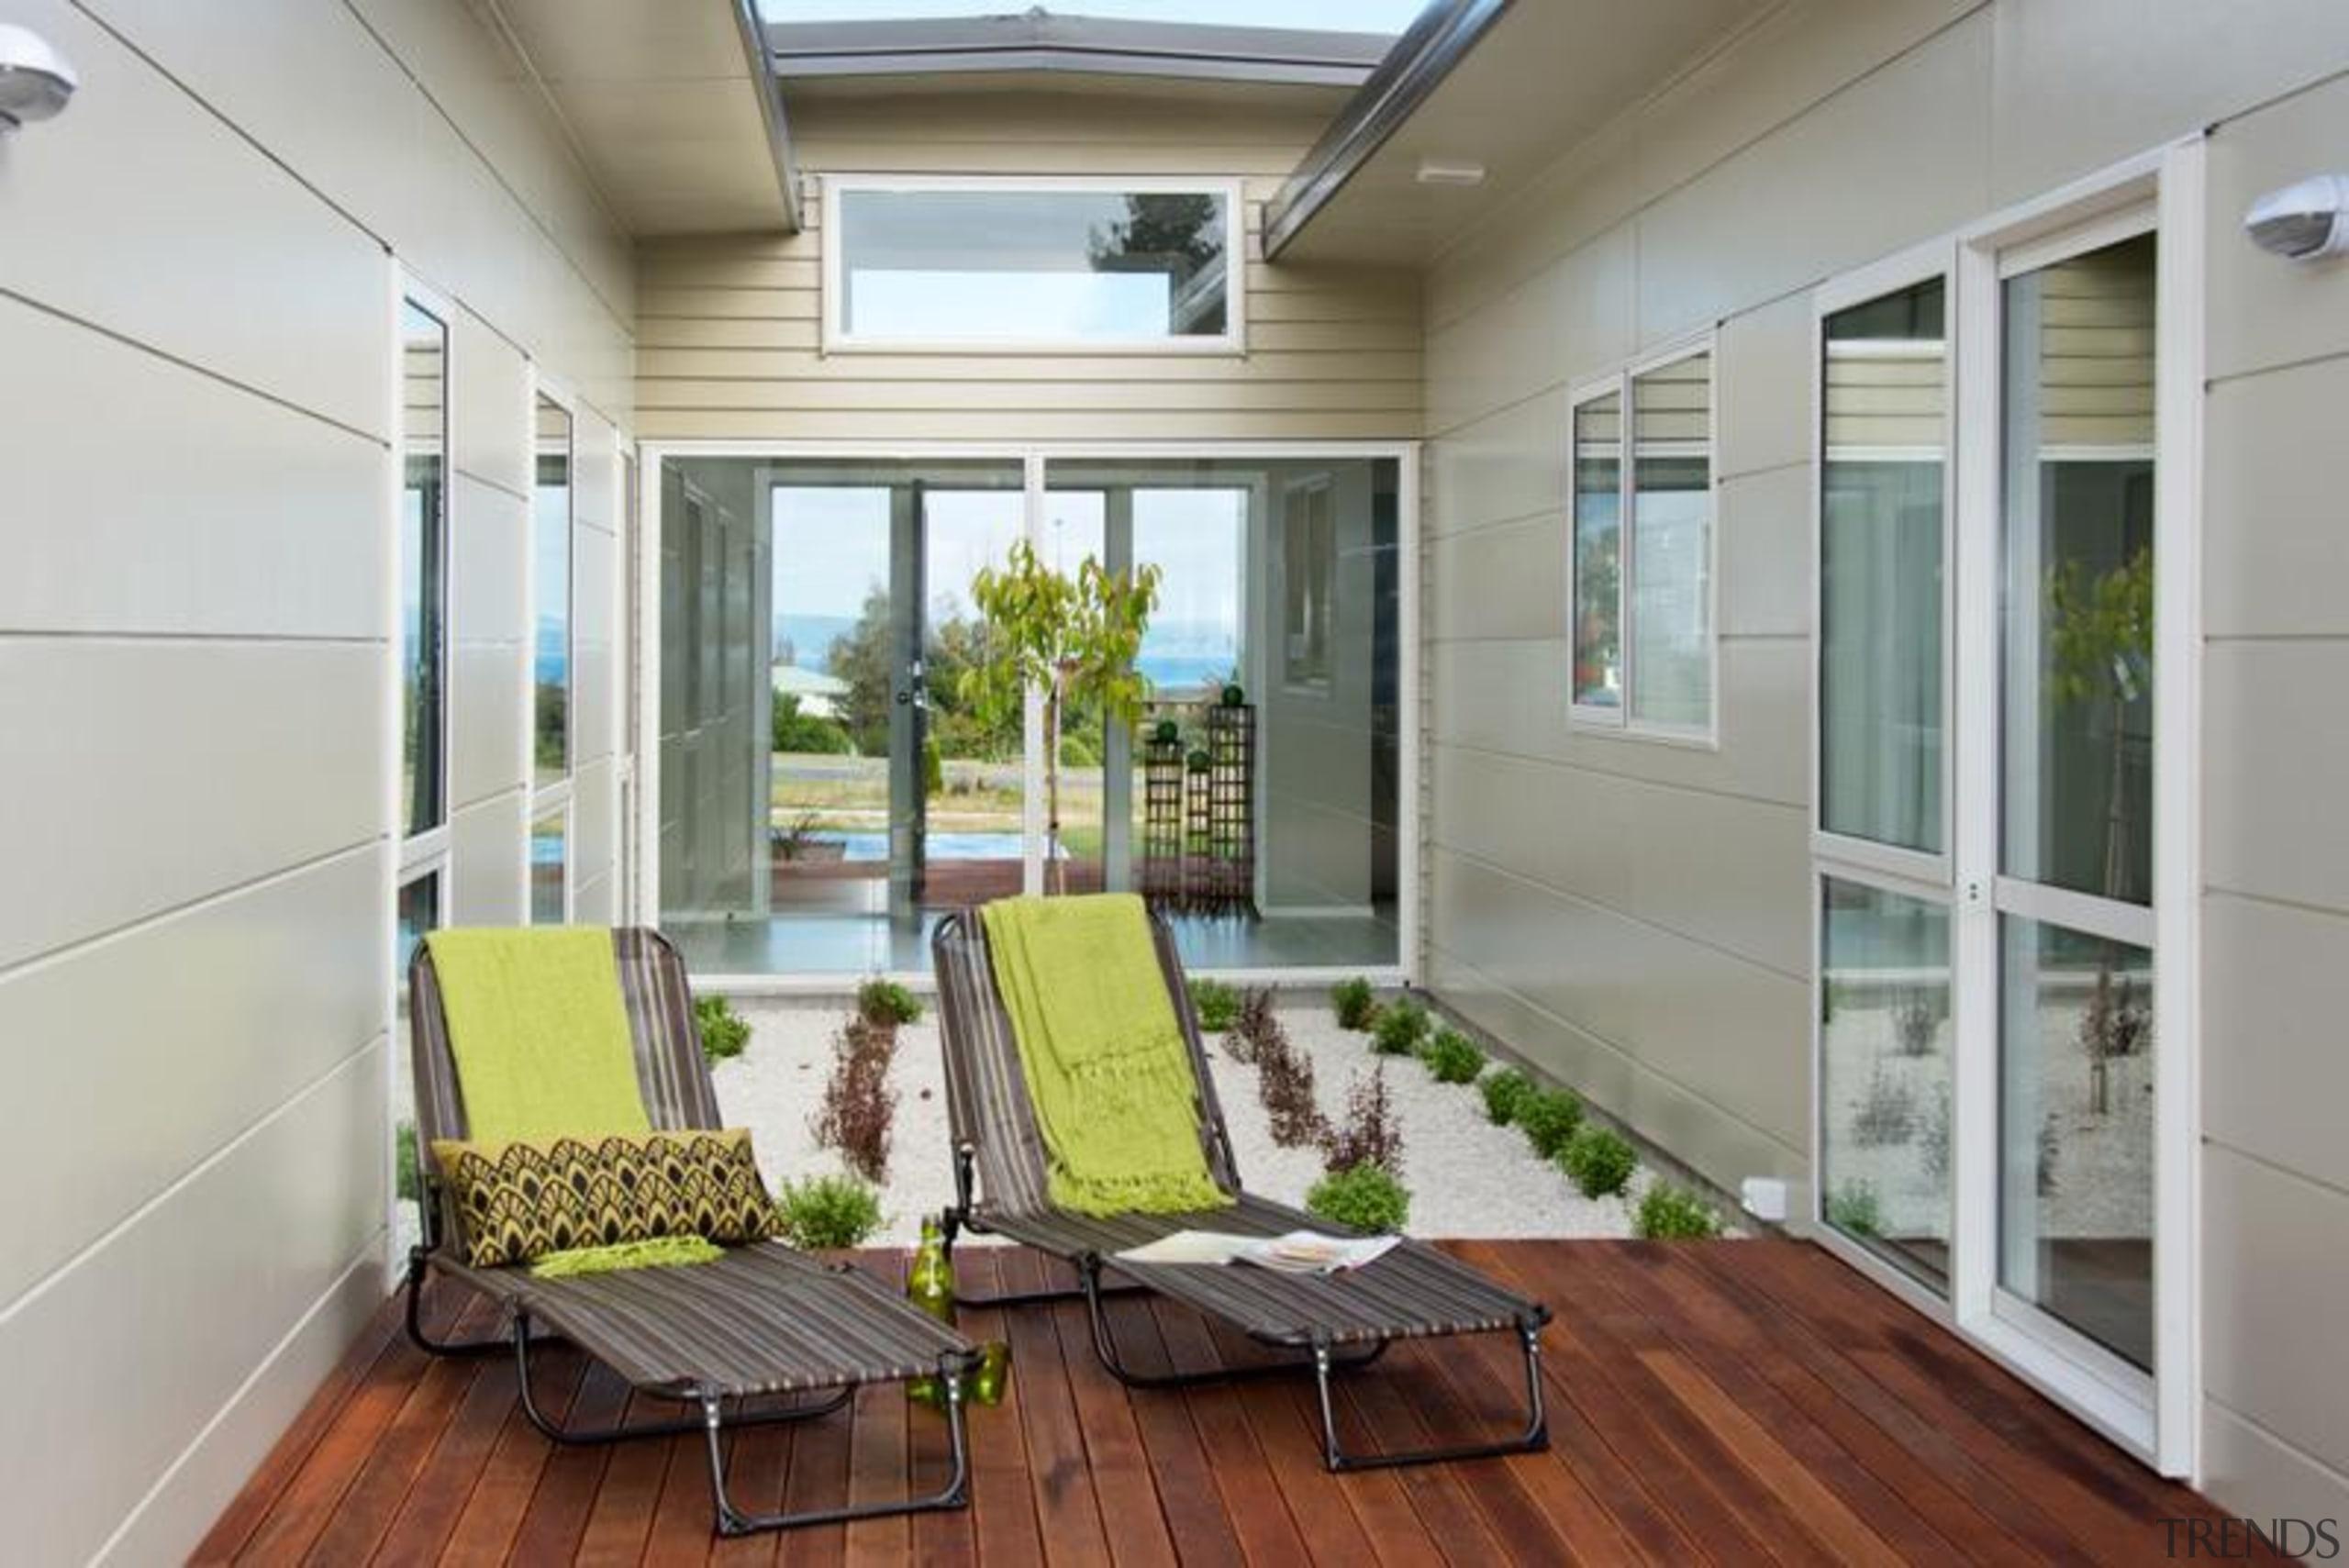 Stria Cladding - Stria Cladding - balcony | balcony, daylighting, home, house, interior design, porch, real estate, window, gray